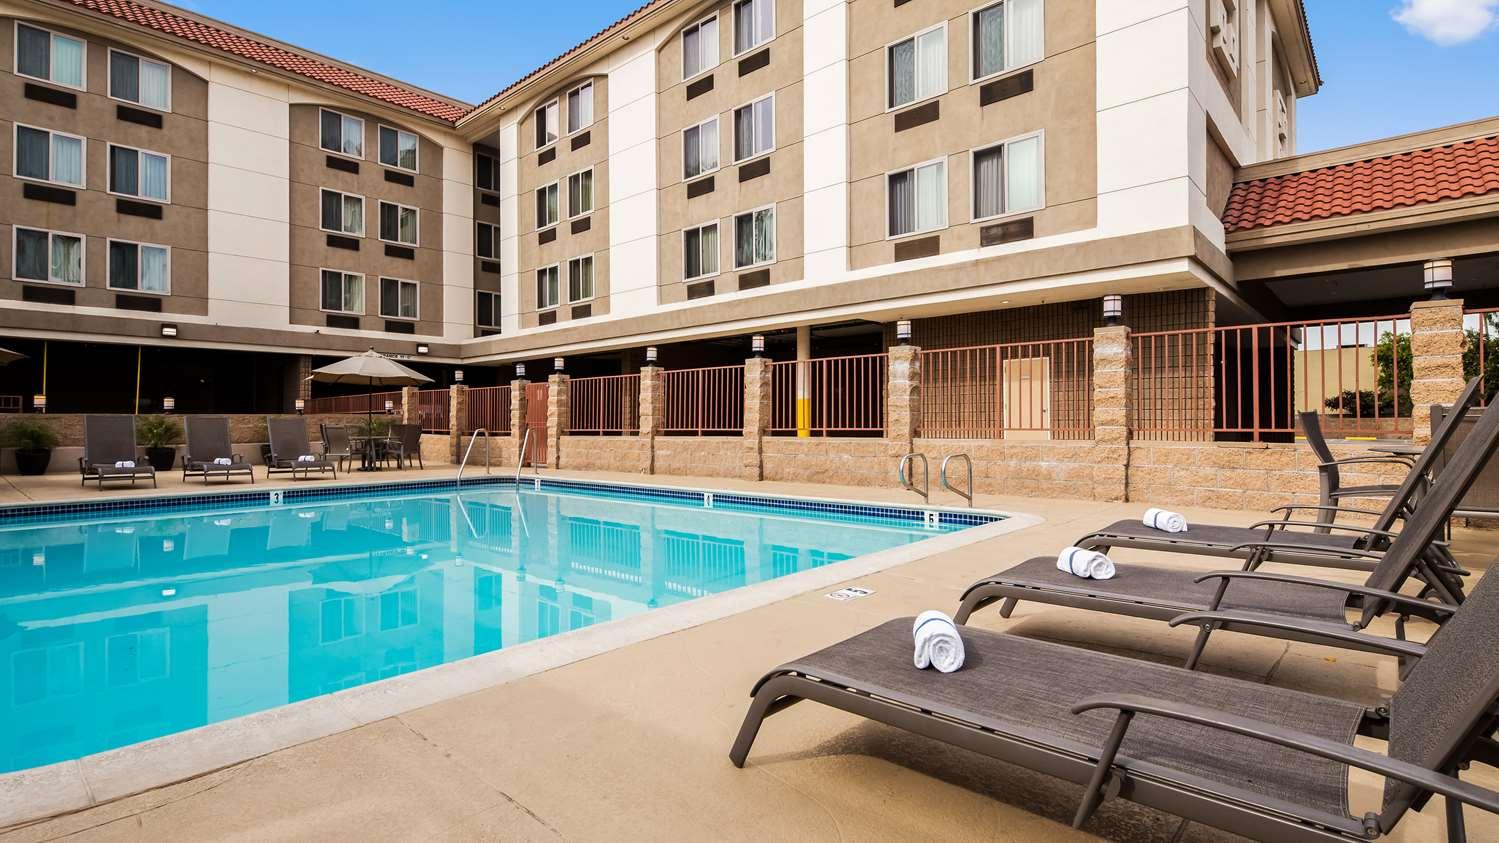 Best Western Hotel Of Long Beach, CA